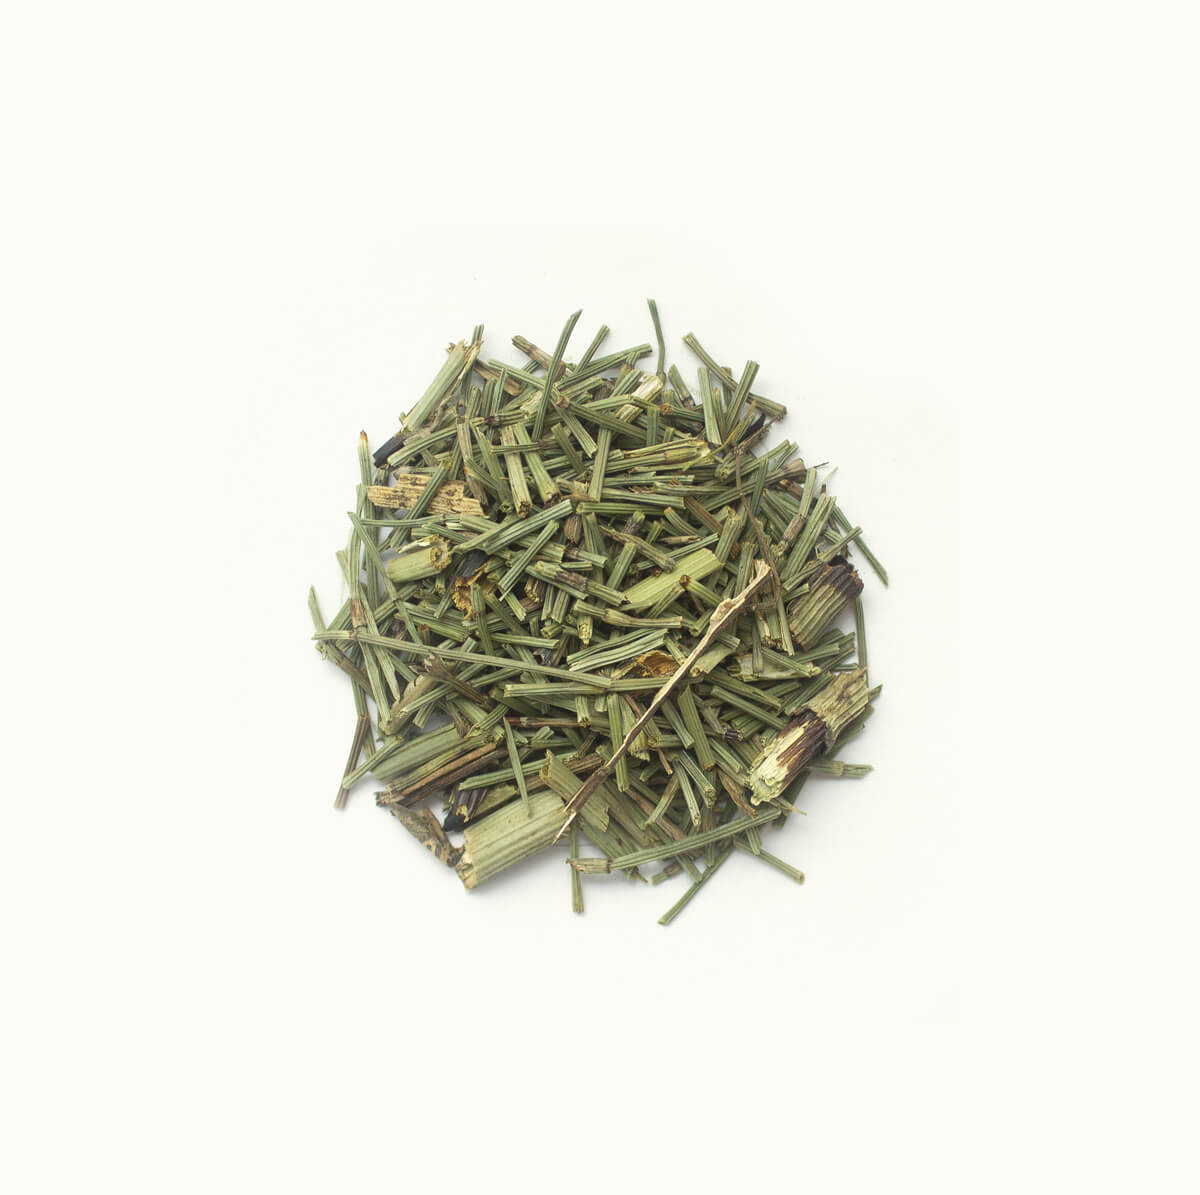 CAVALINHA - Equisetum arvense - 30g